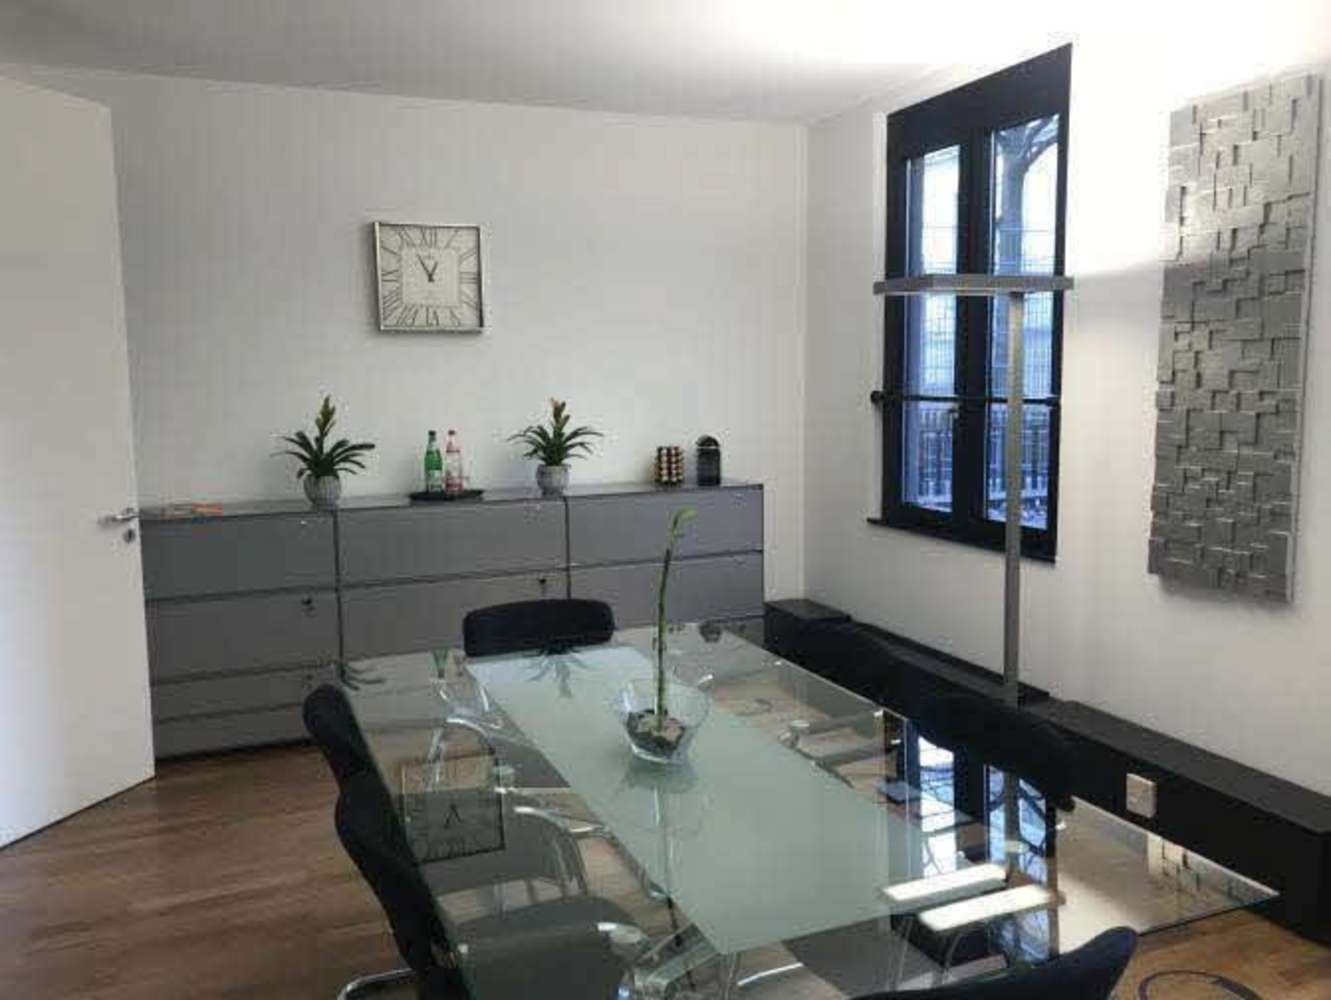 Büros Frankfurt am main, 60329 - Büro - Frankfurt am Main, Bahnhofsviertel - F0050 - 10482667